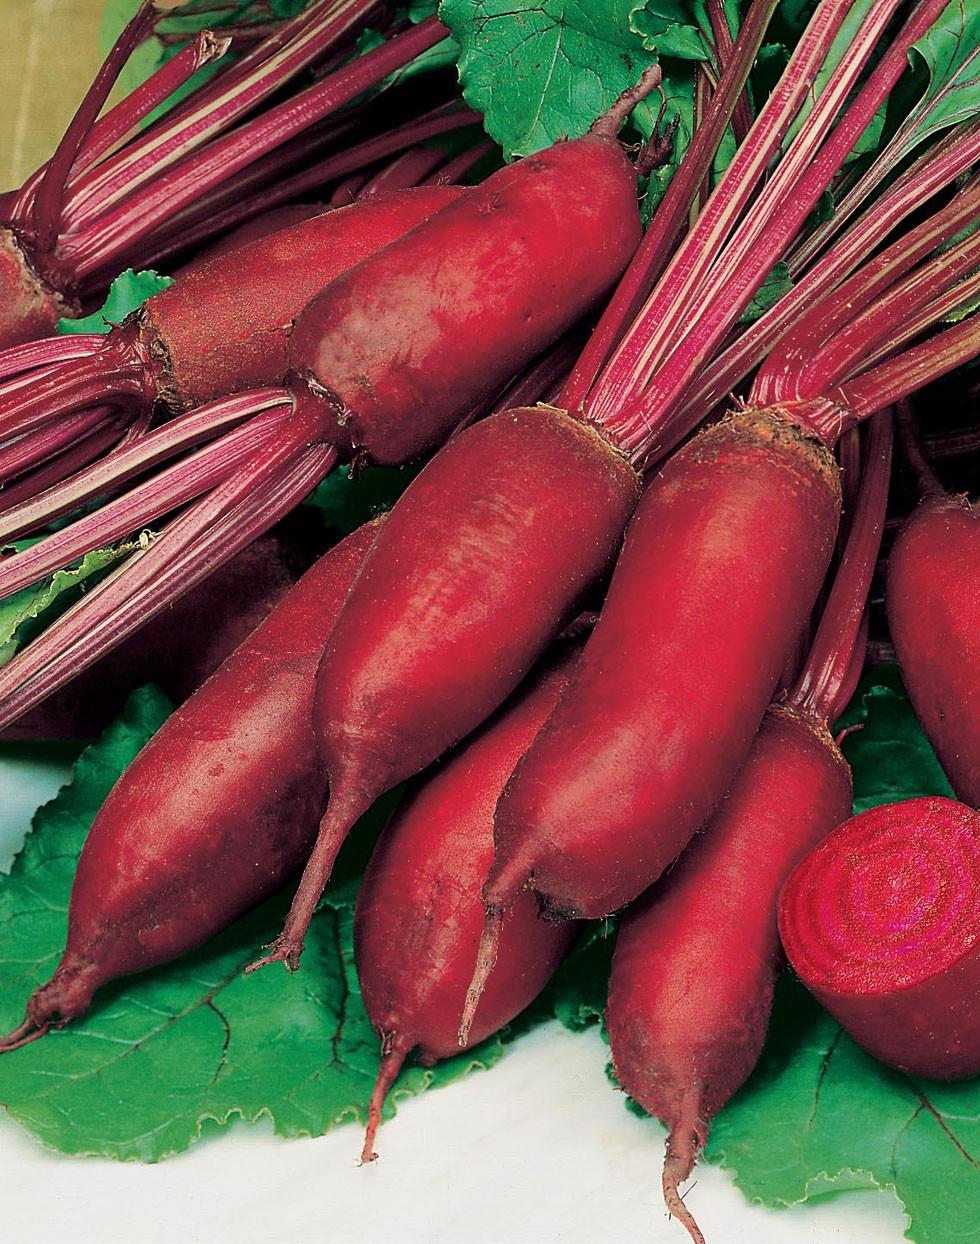 cylindra-beet-seeds-edmonton-alberta